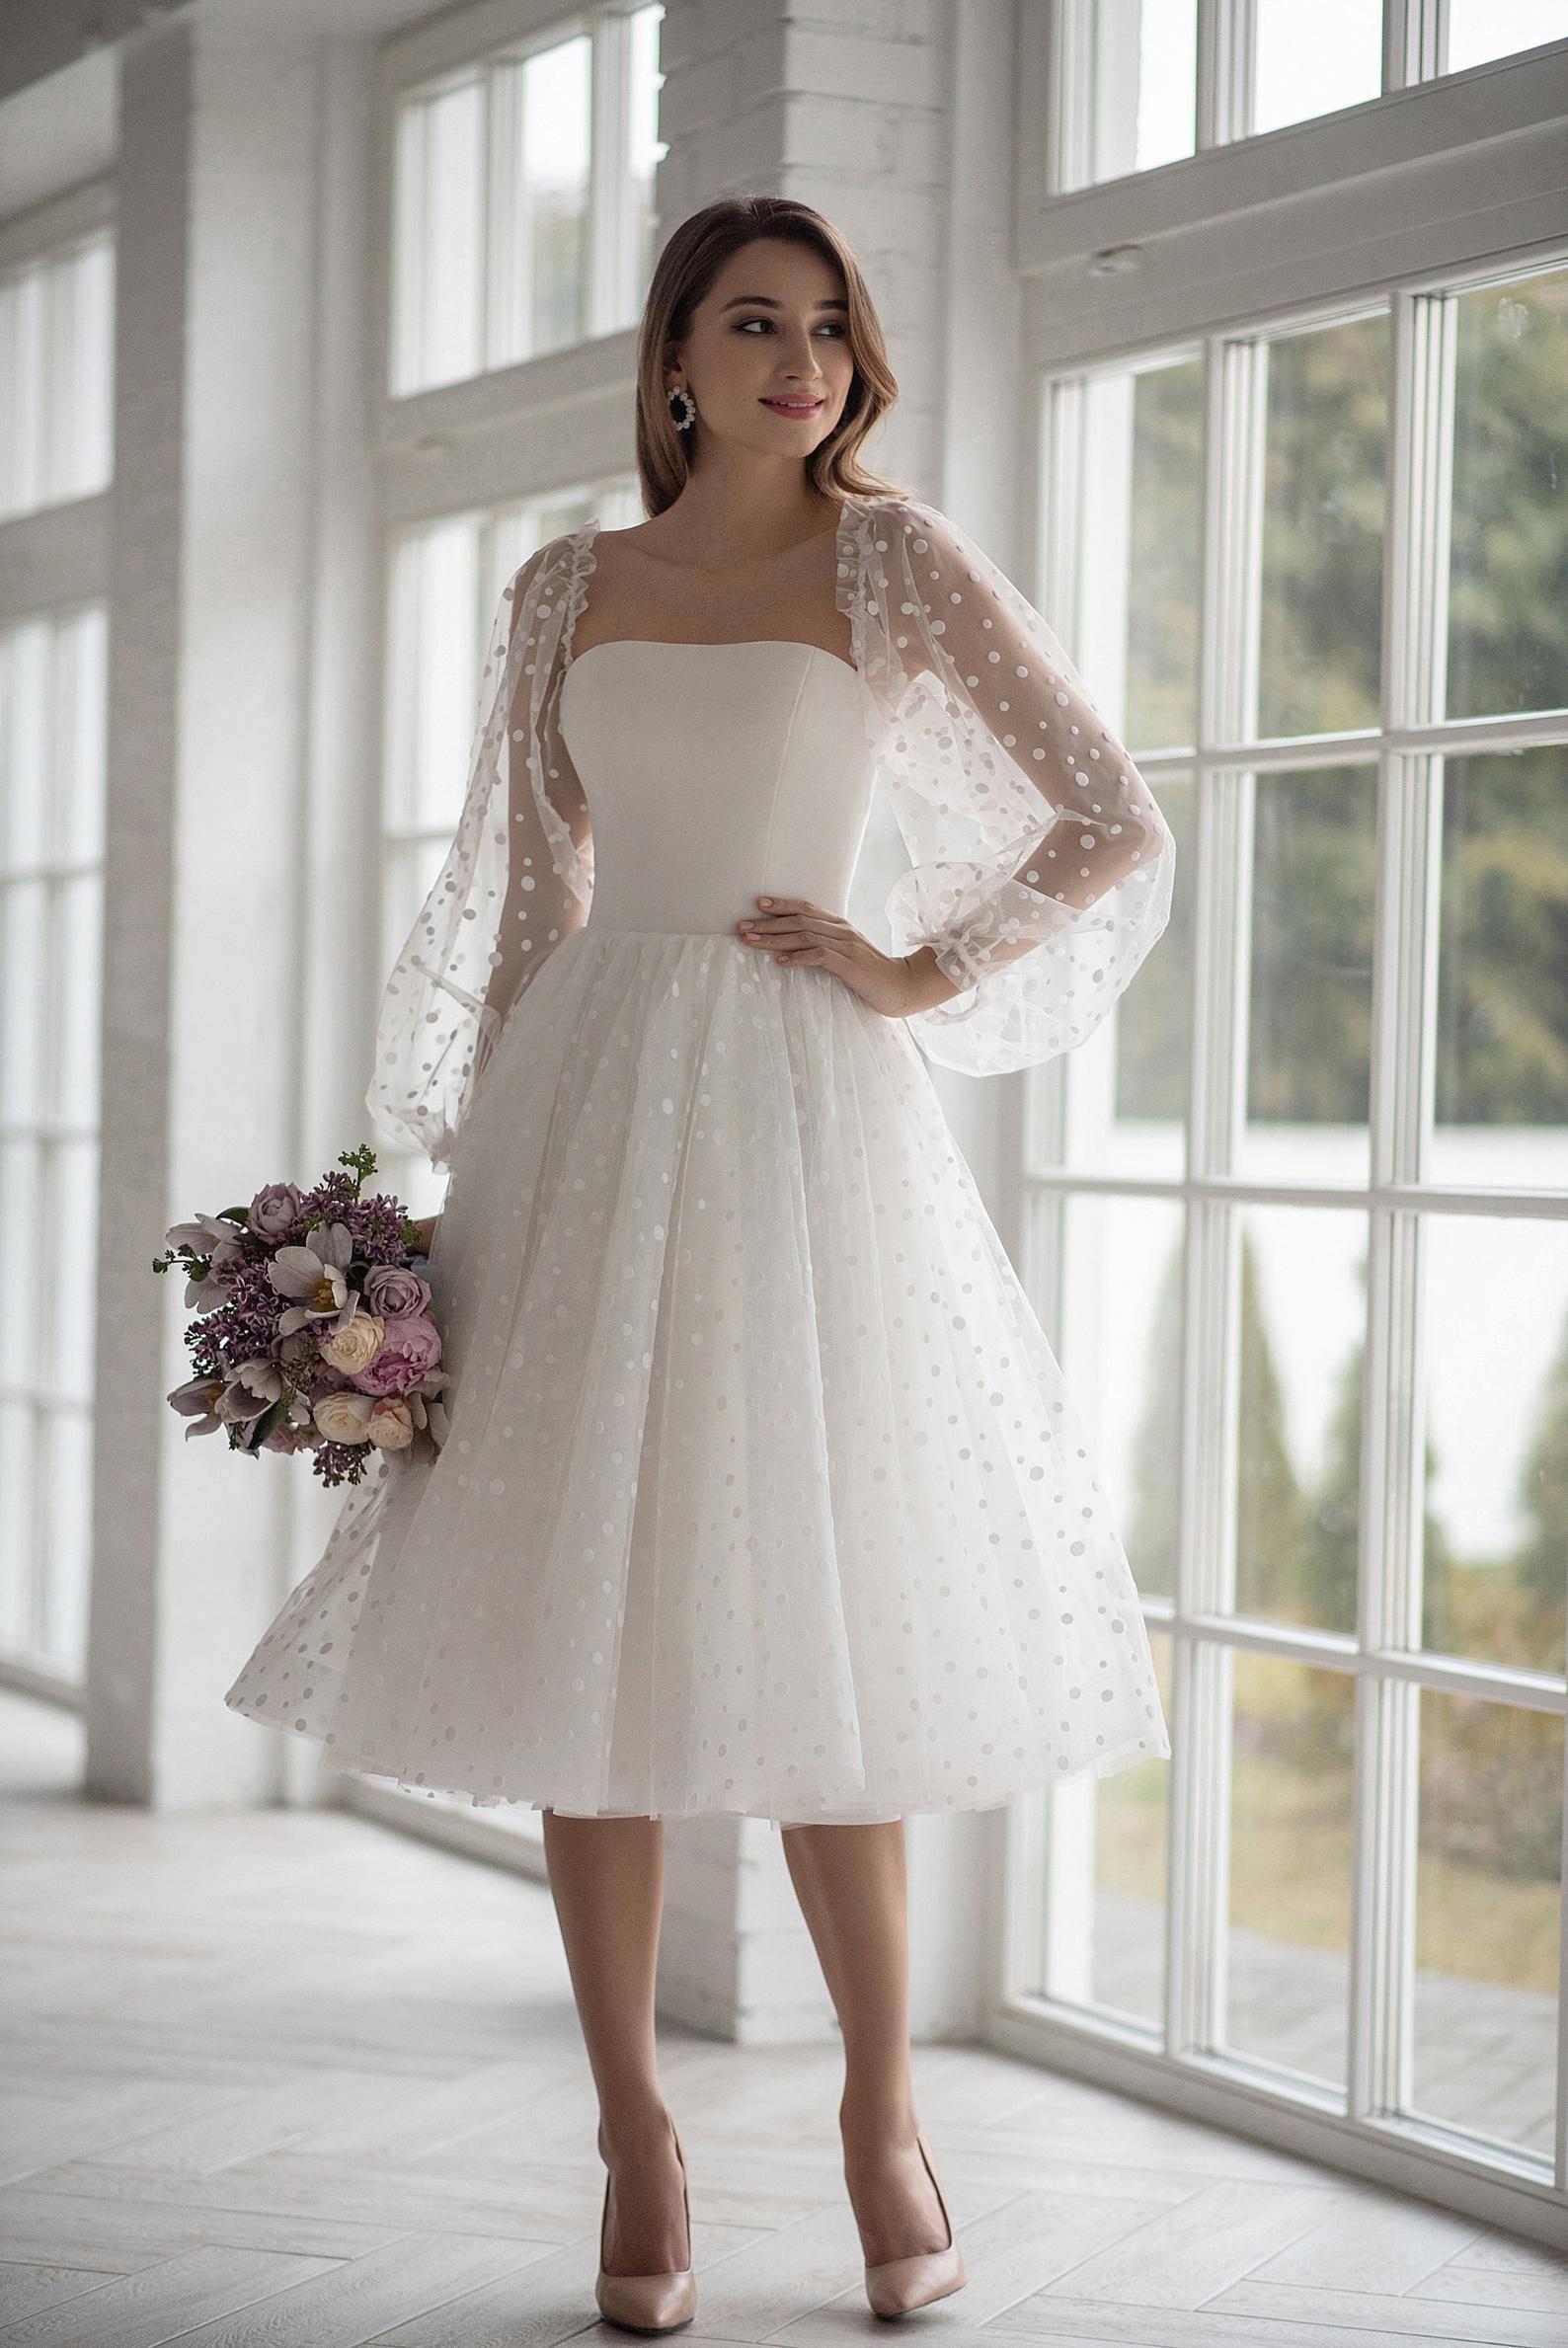 Boho Wedding Dress Tea Length Short Mini Tulle Peas Light Ivory Wedding Gown Off Sloulder Long Sleeve Elegant Beach Short Modern Simple Lace Vestido Casamento Civil Simples Vestido Para Noivas Casamento [ 2378 x 1588 Pixel ]